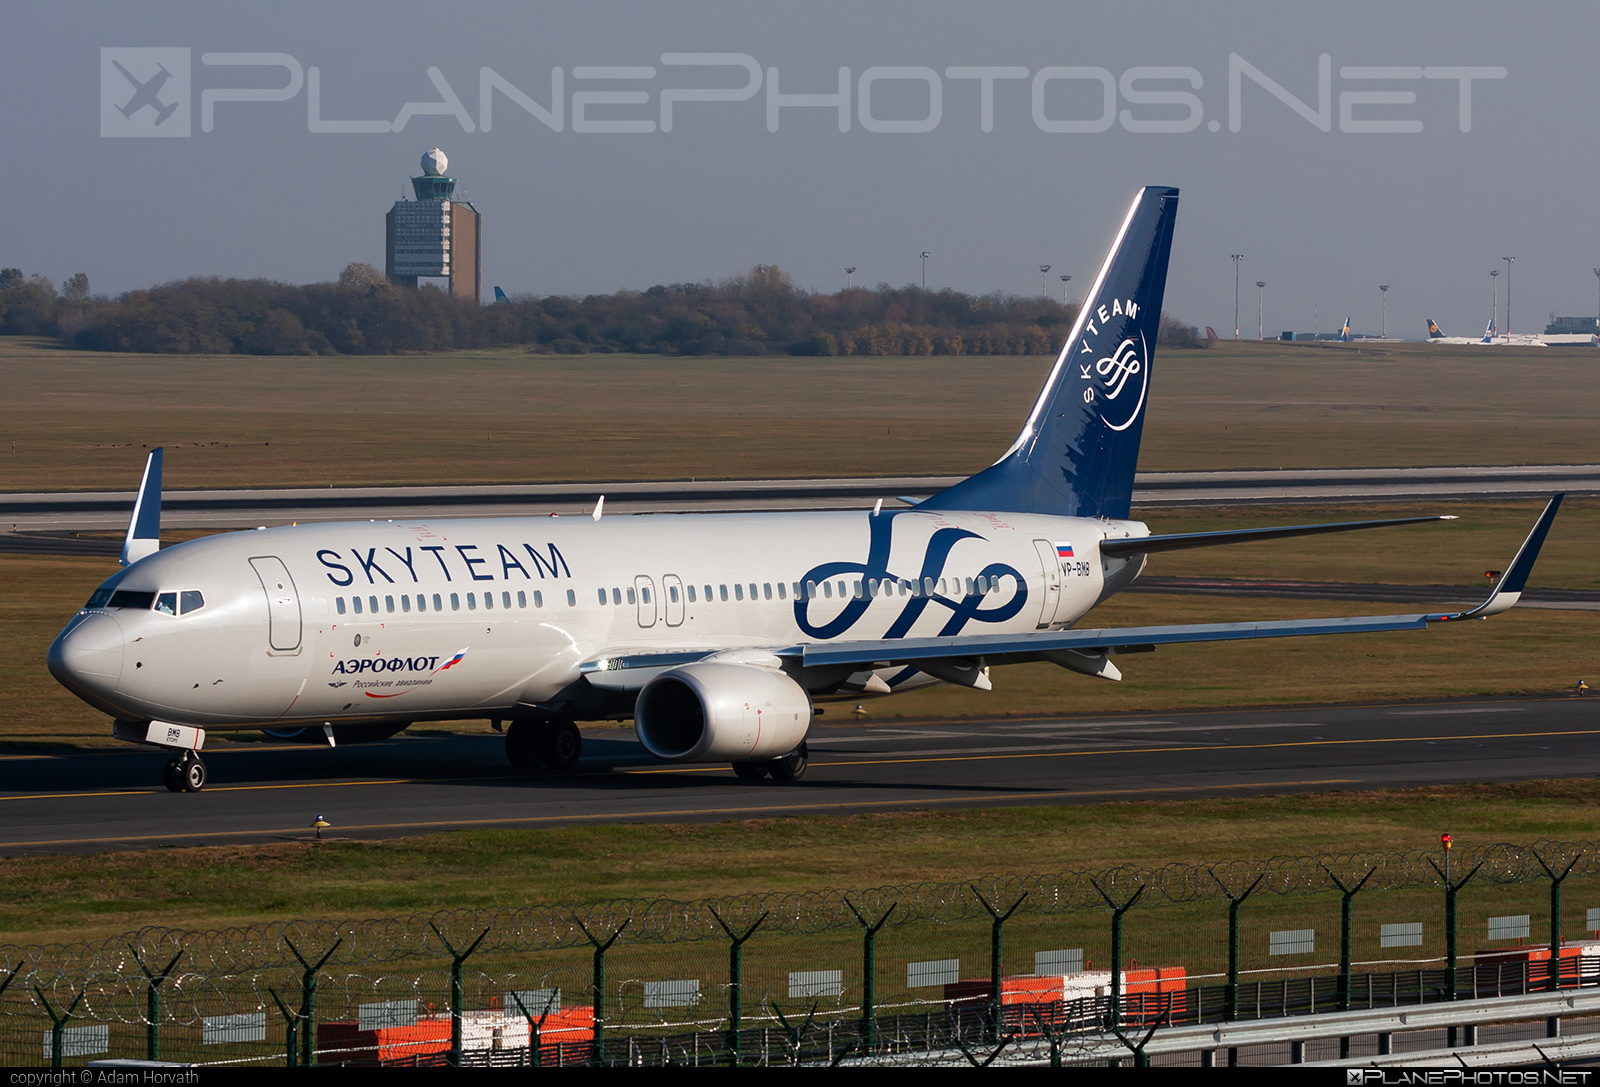 Aeroflot Boeing 737-800 - VP-BMB #aeroflot #b737 #b737nextgen #b737ng #boeing #boeing737 #skyteam